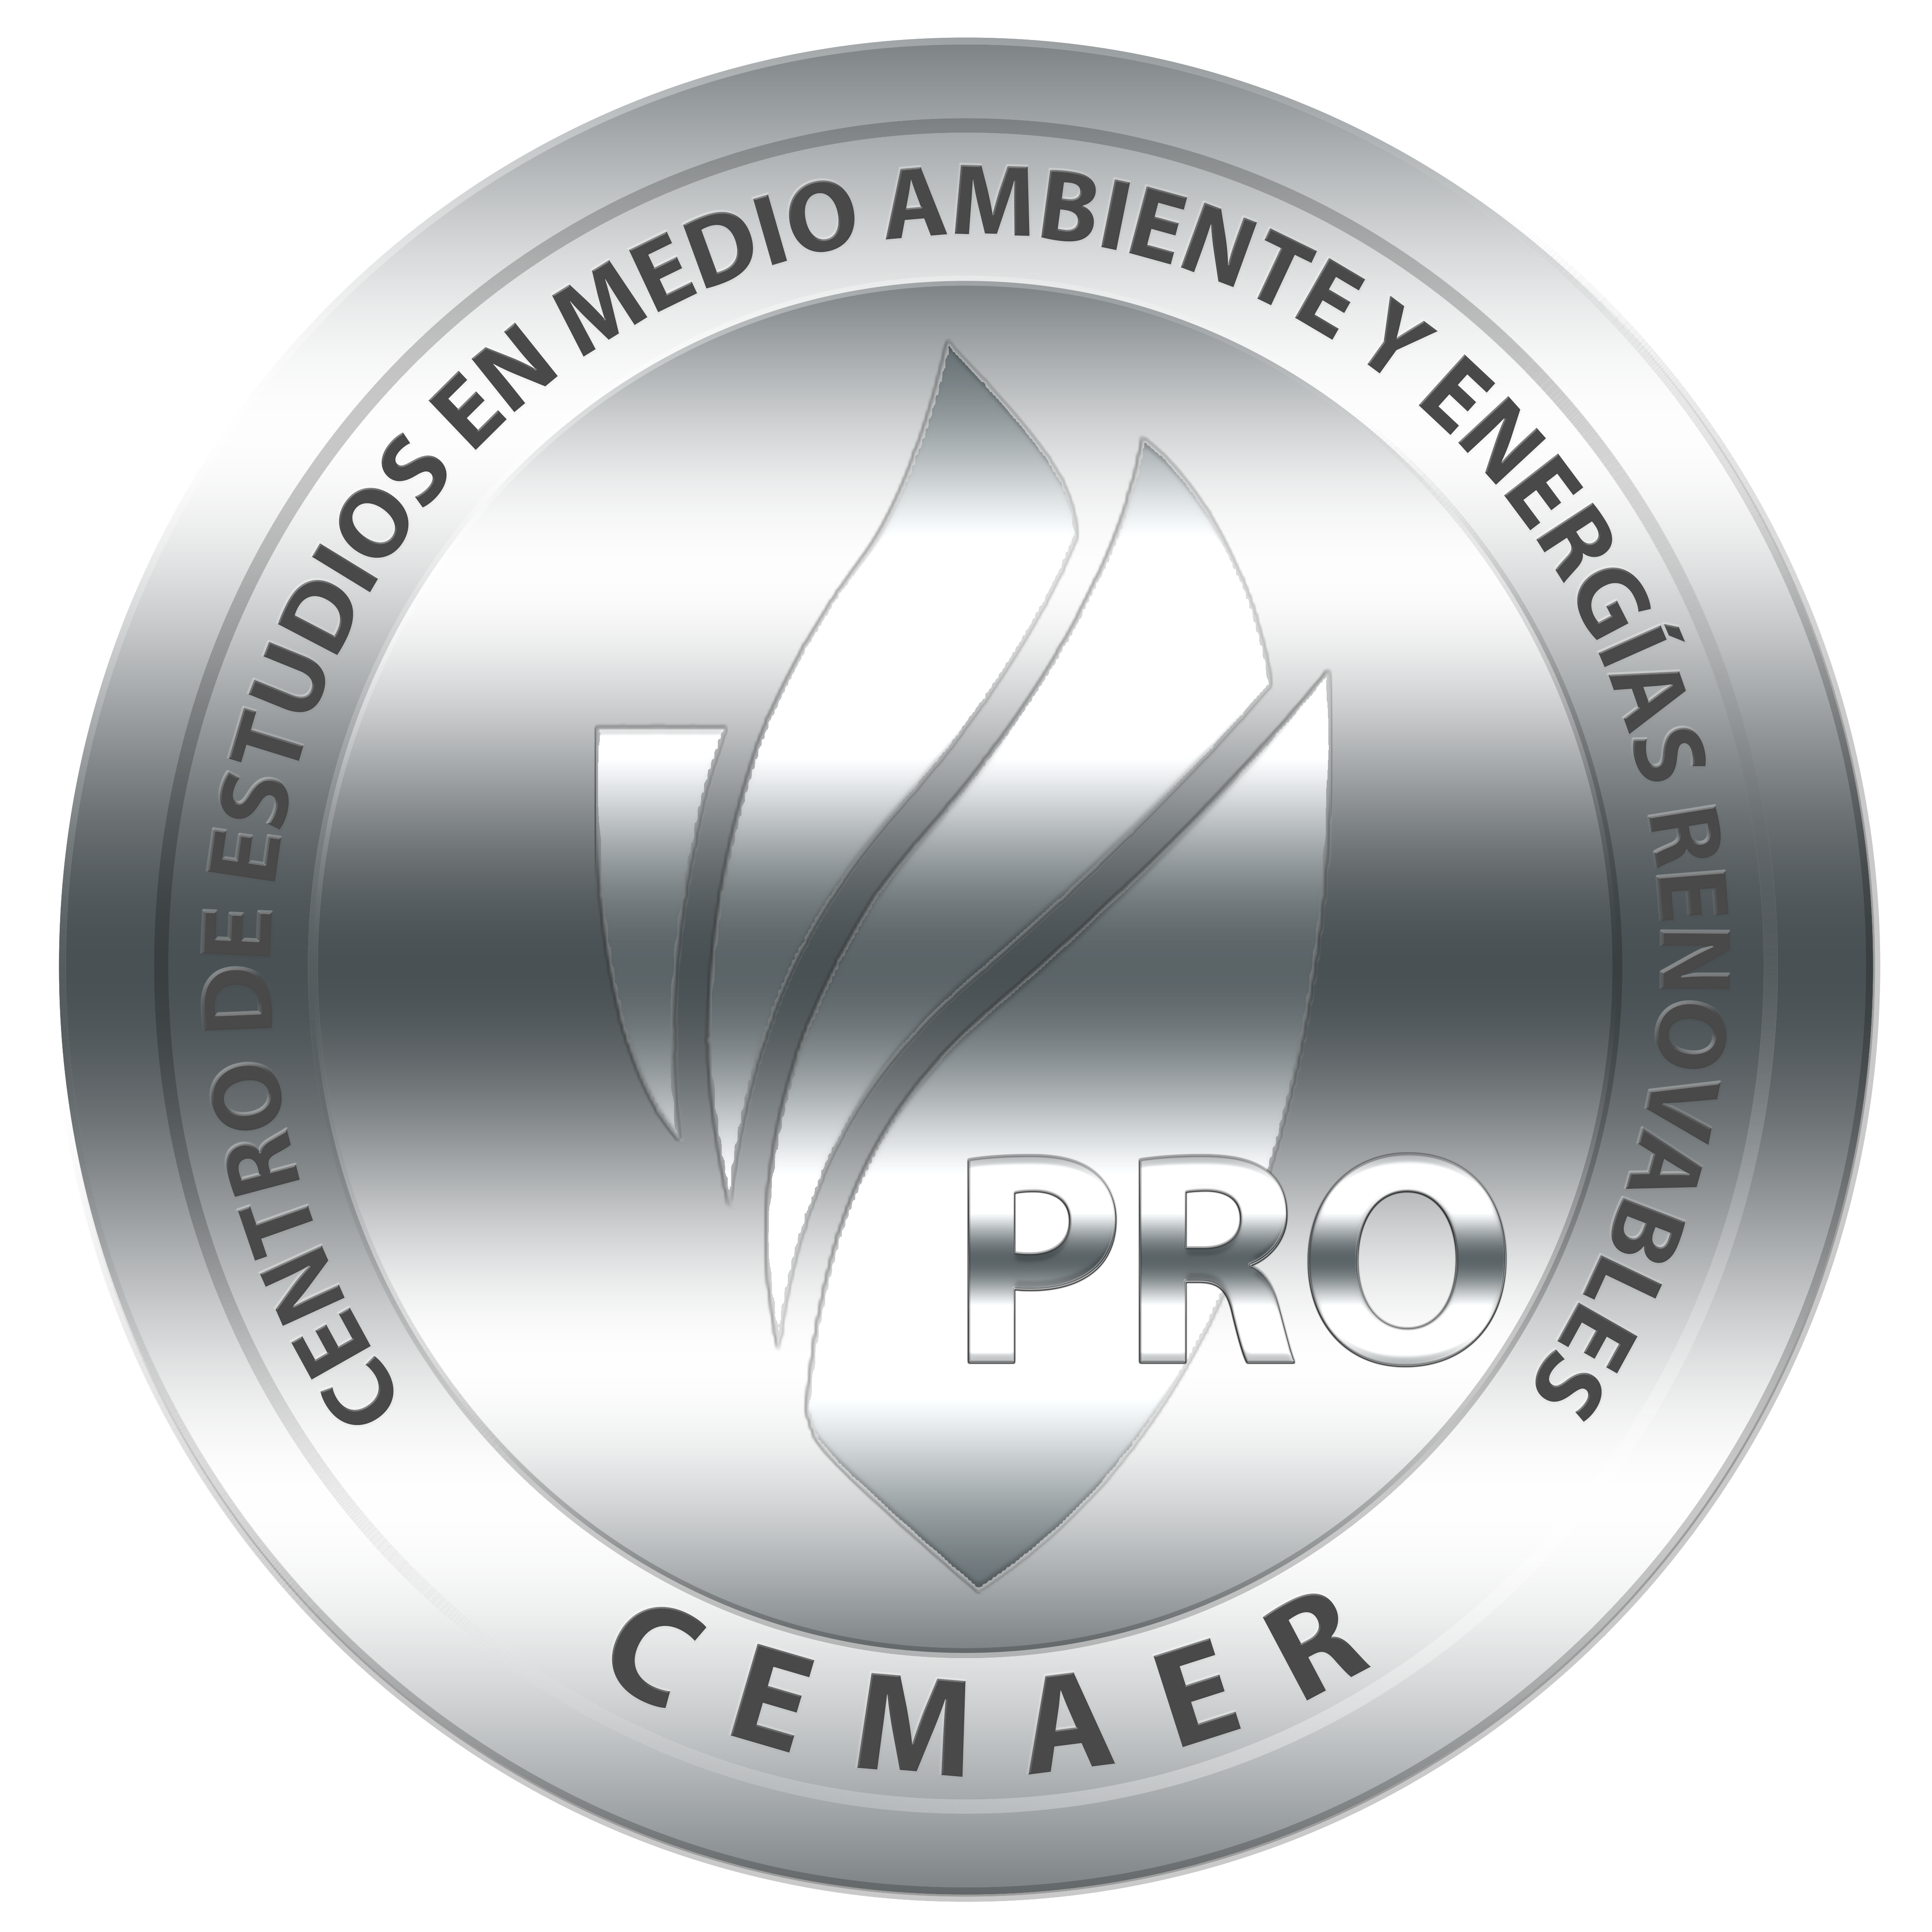 cemaer_pro_badge